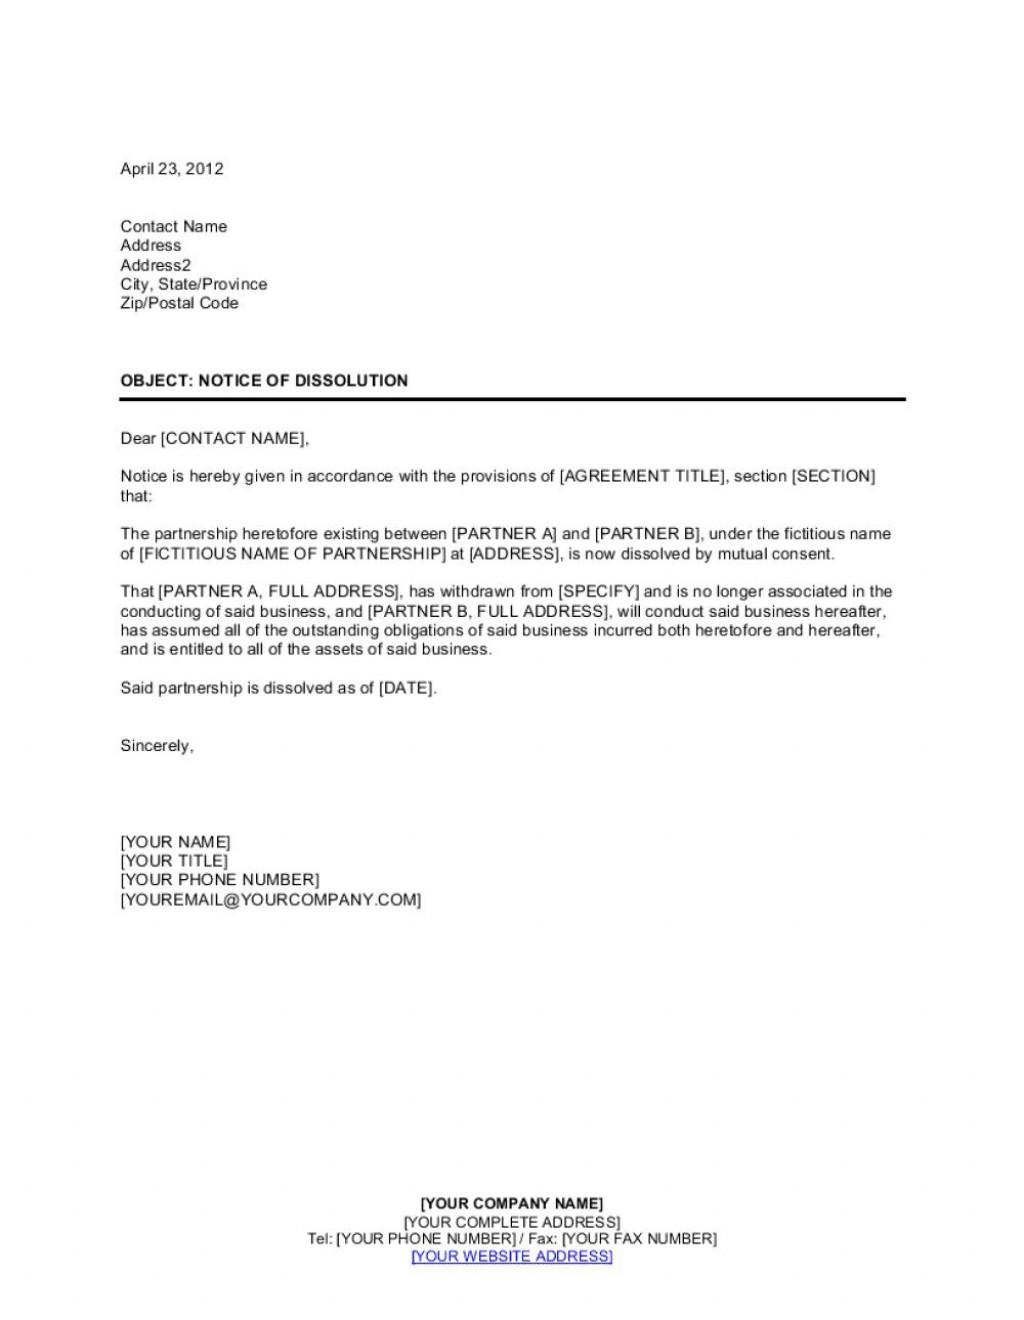 003 Top Busines Partnership Separation Agreement Template Photo  Partner TerminationLarge